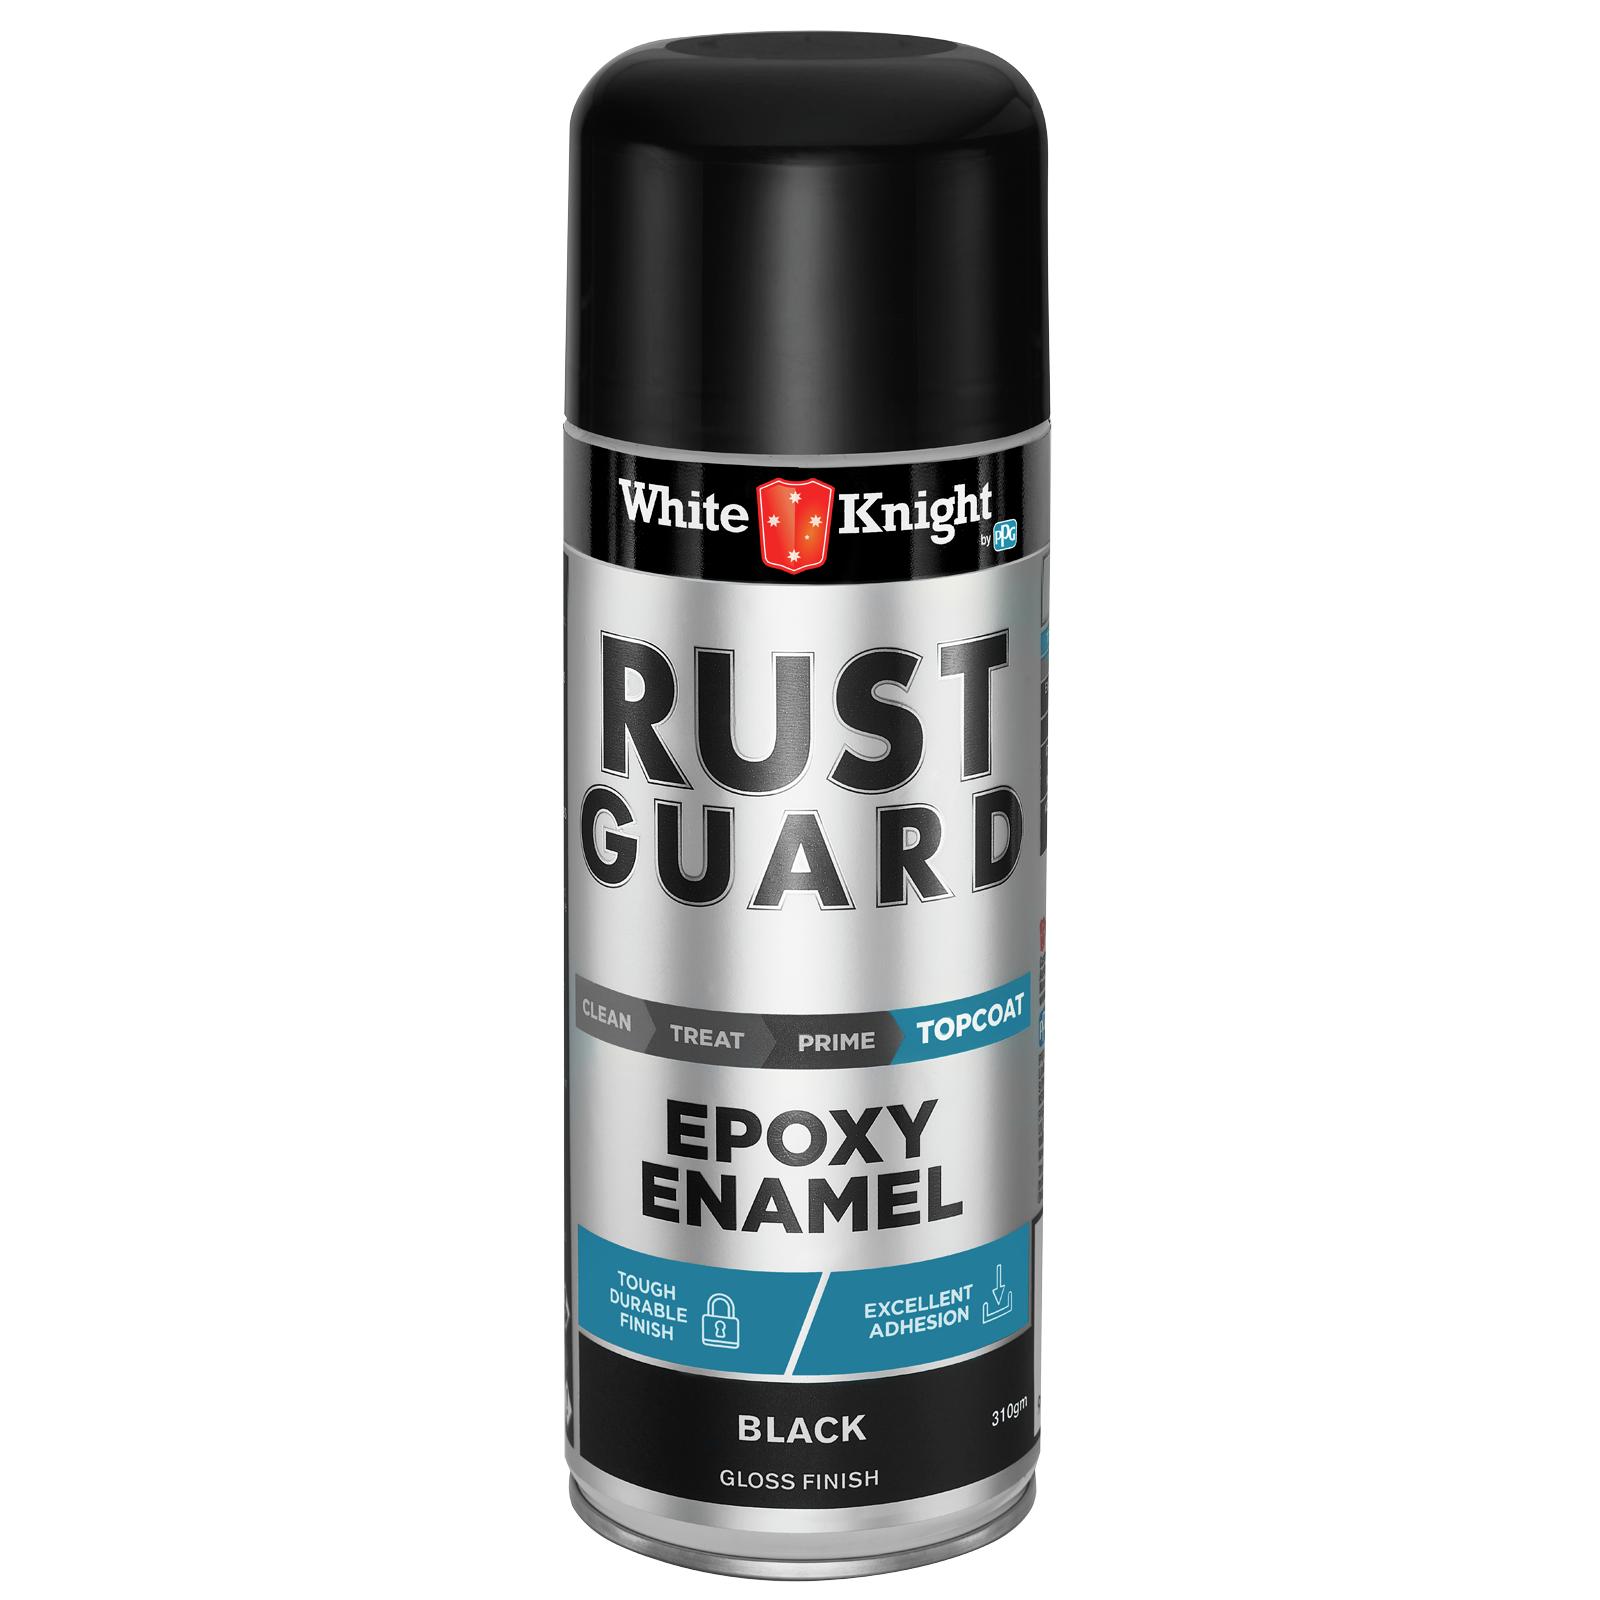 White Knight 310g Black Gloss Rust Guard Epoxy Enamel